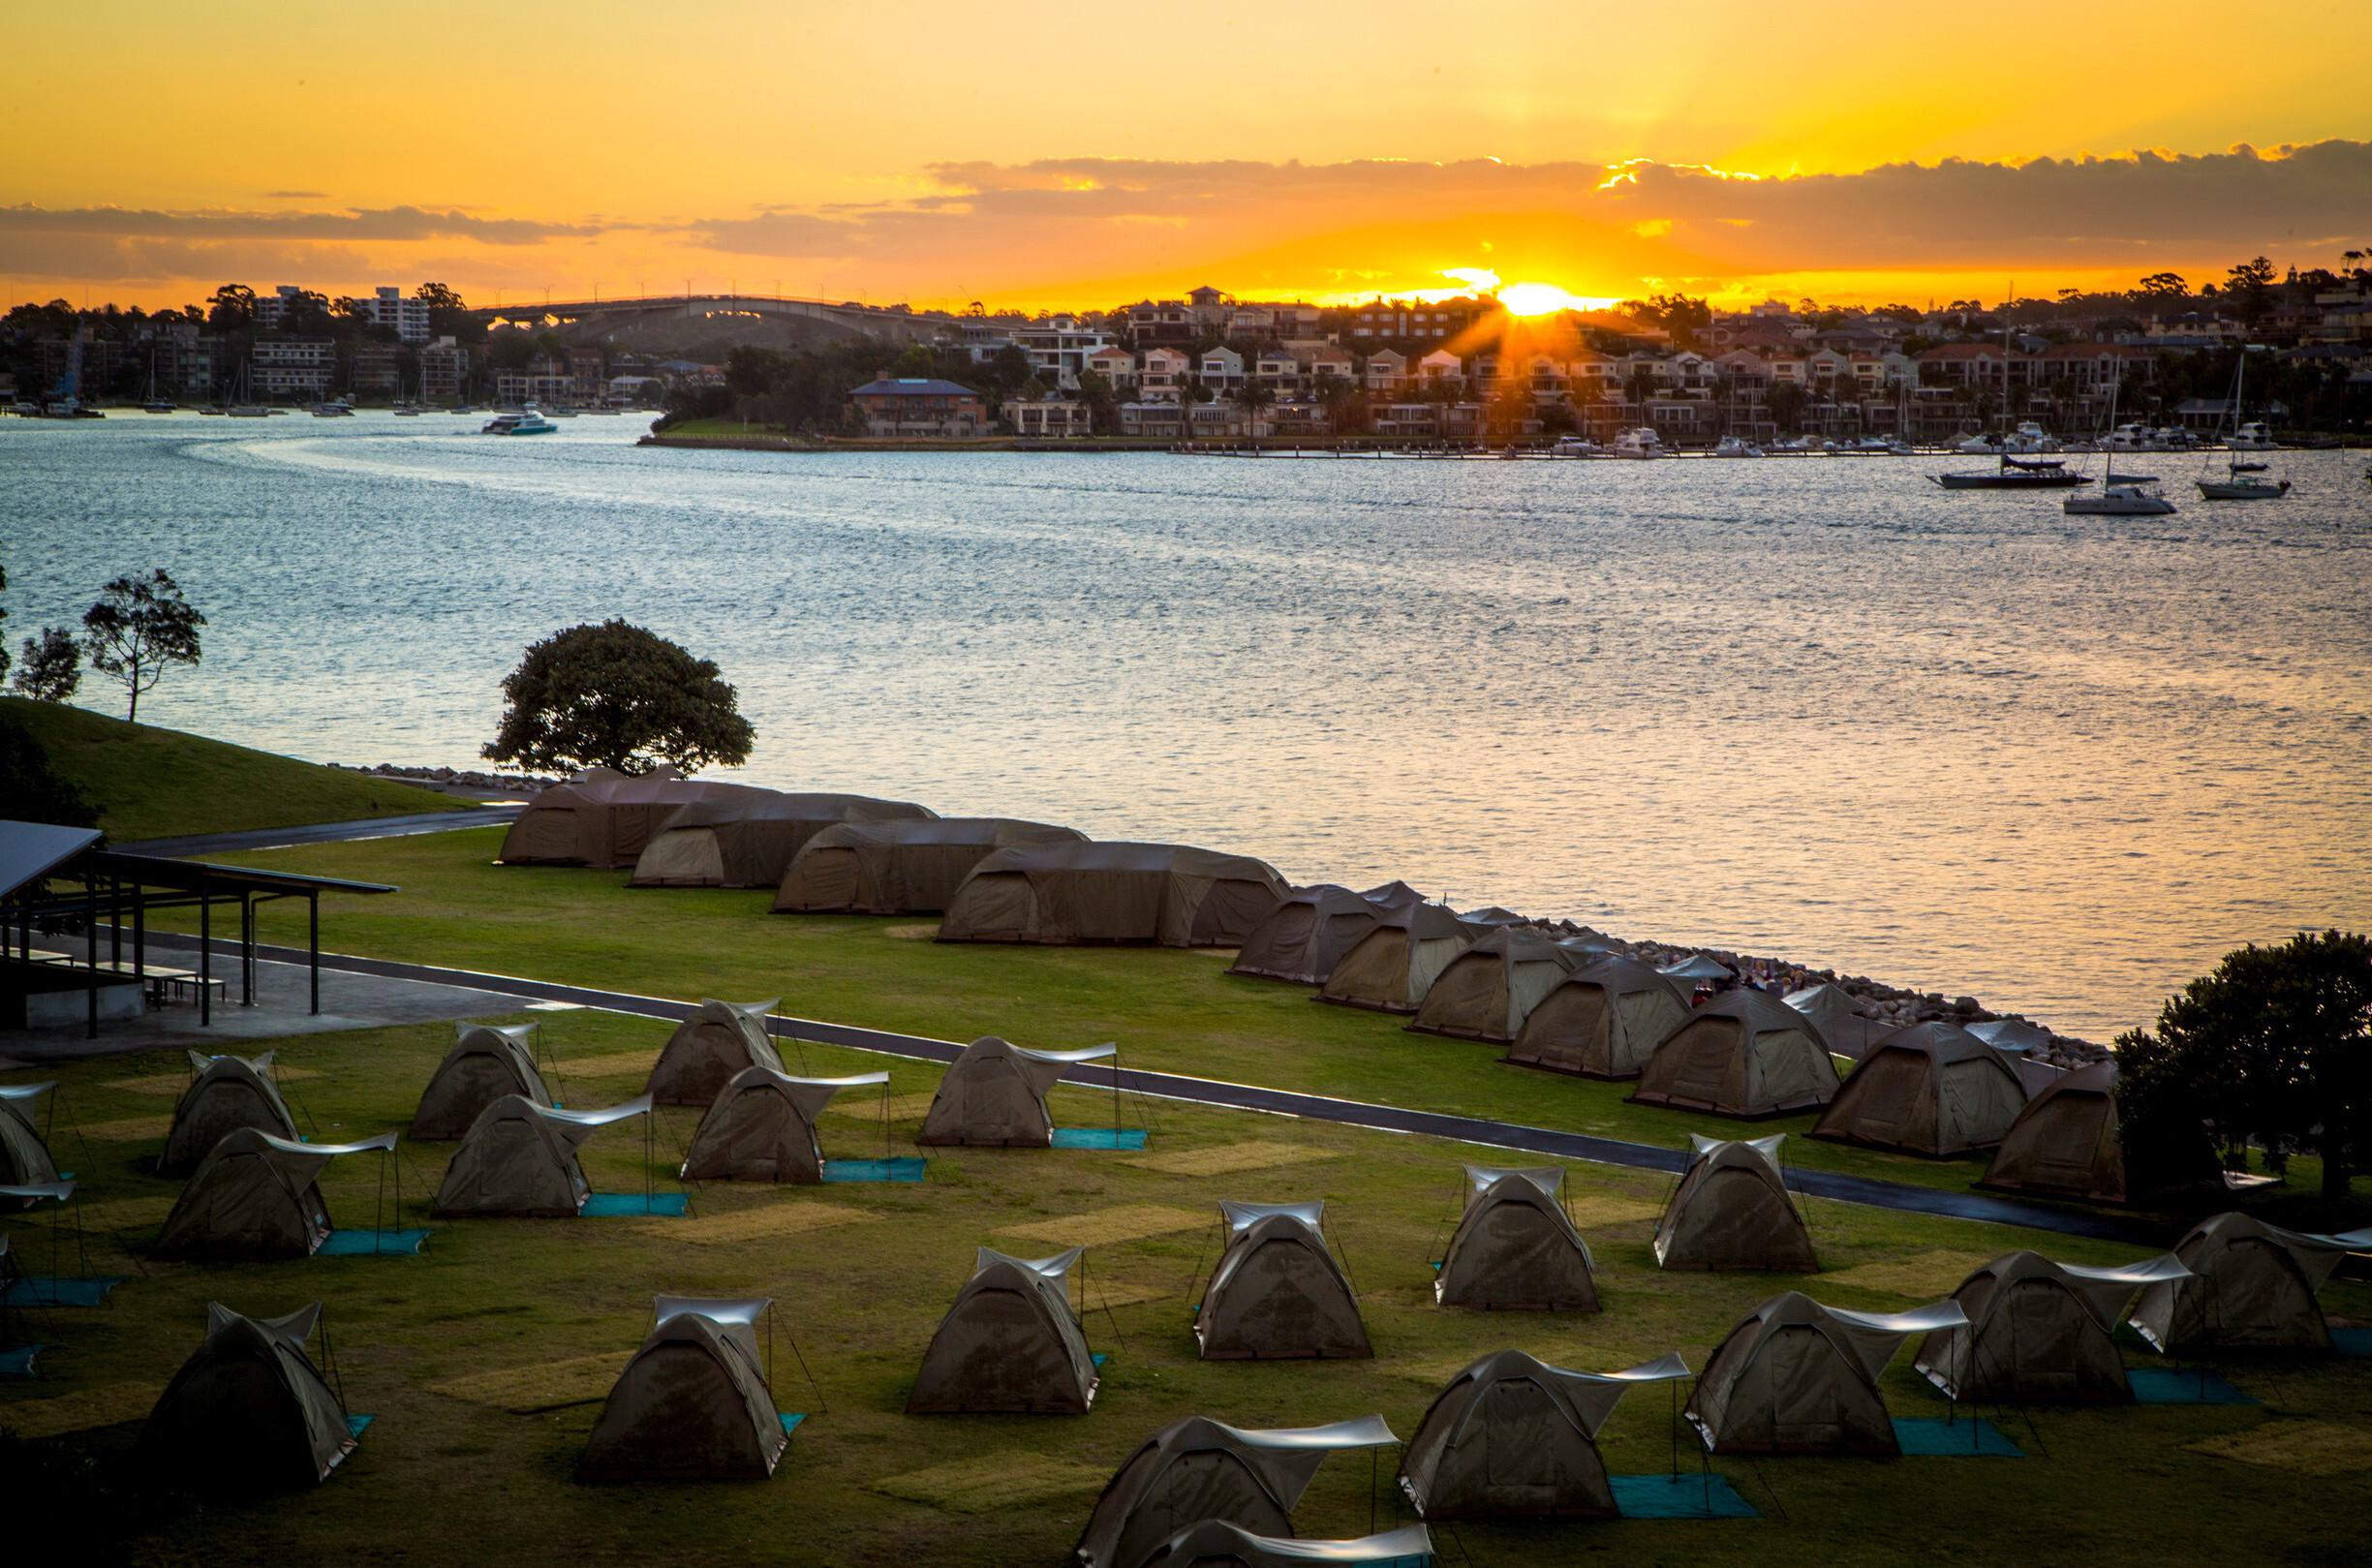 Camping, Cockatoo Island